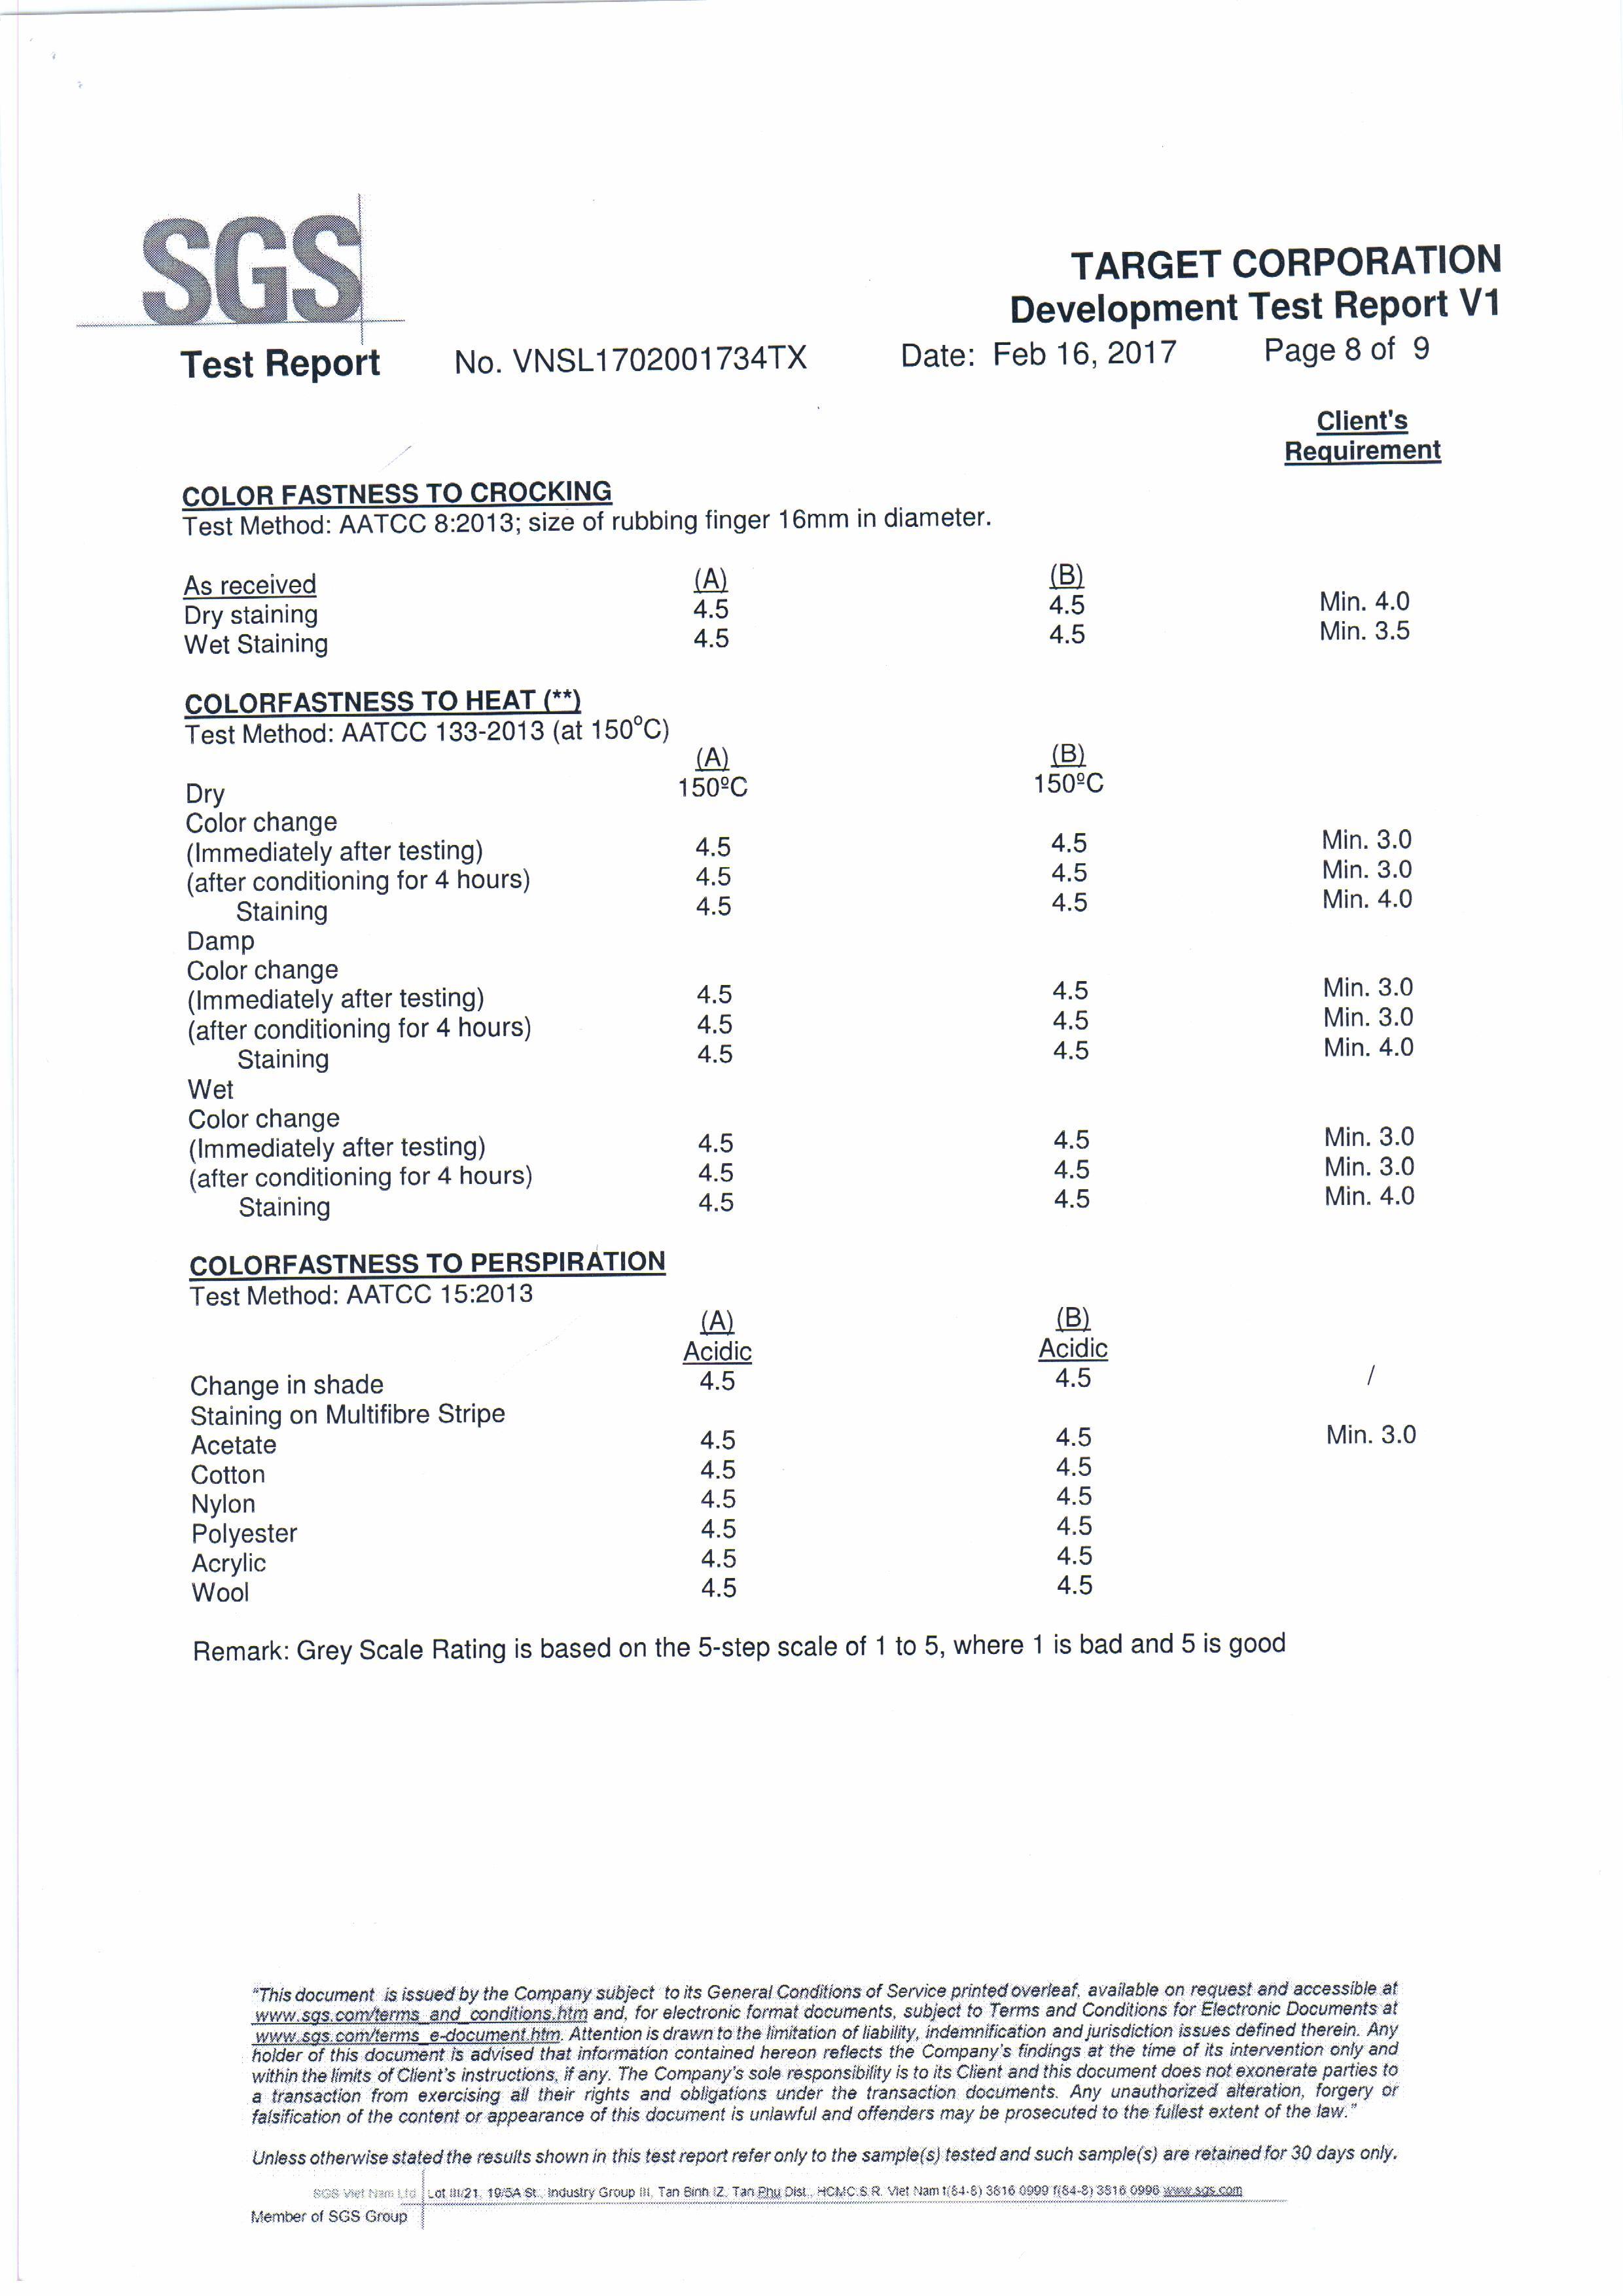 FILE TEST REPORT